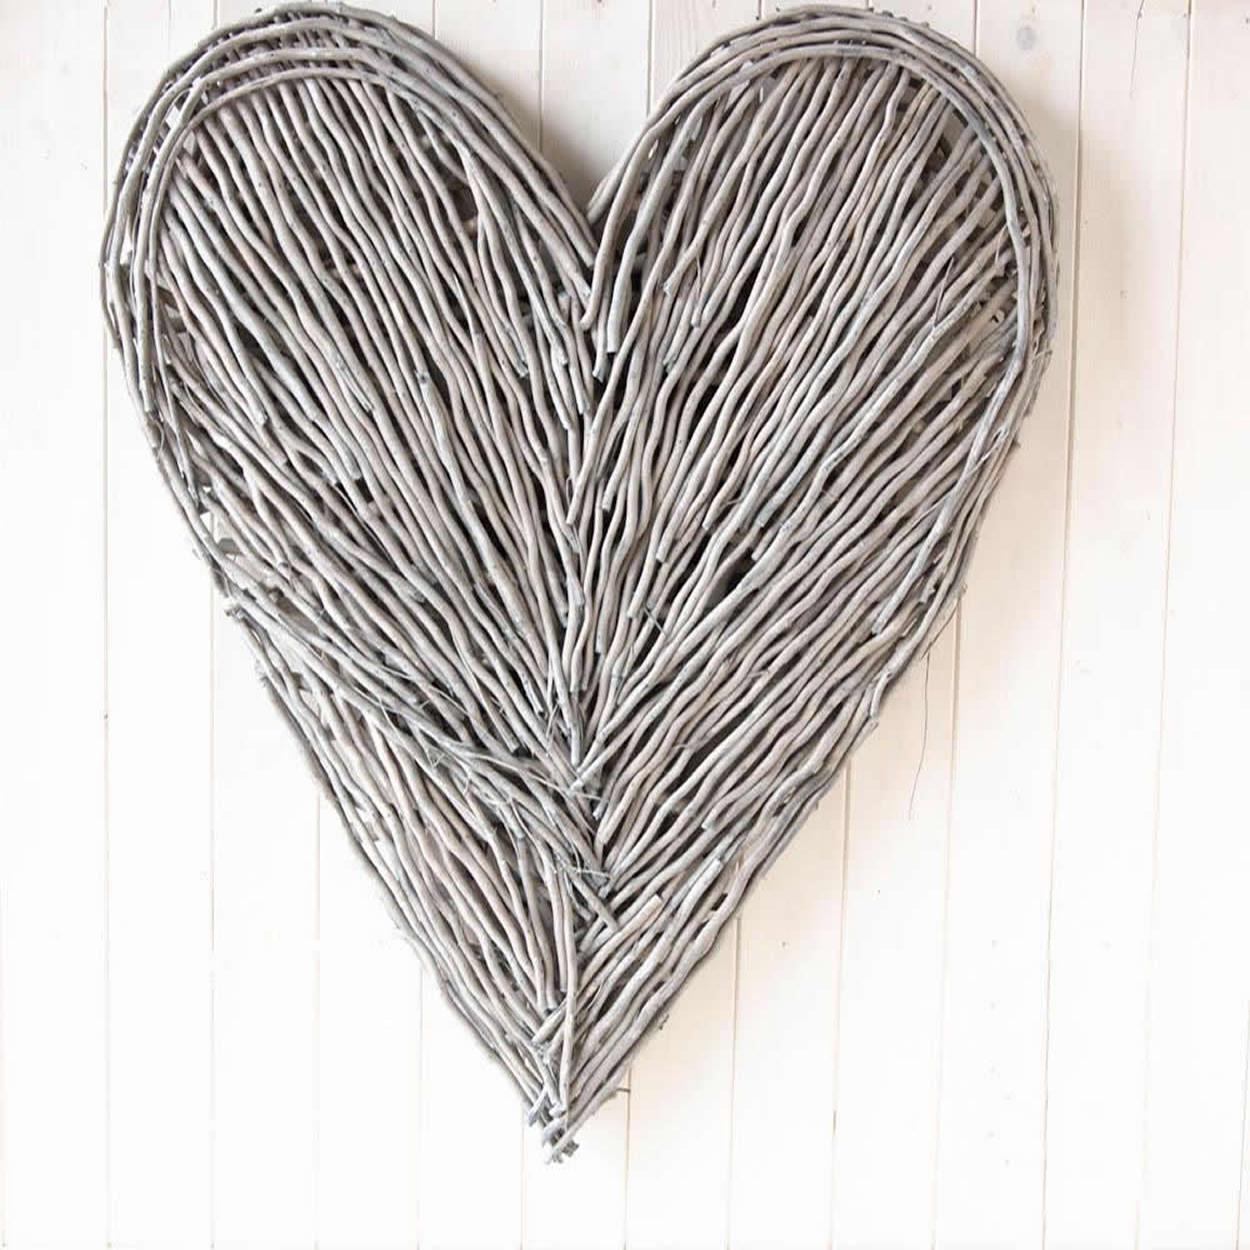 Extra Large Wicker Wall Heart Natural Heart Wall Wicker Hearts Wicker